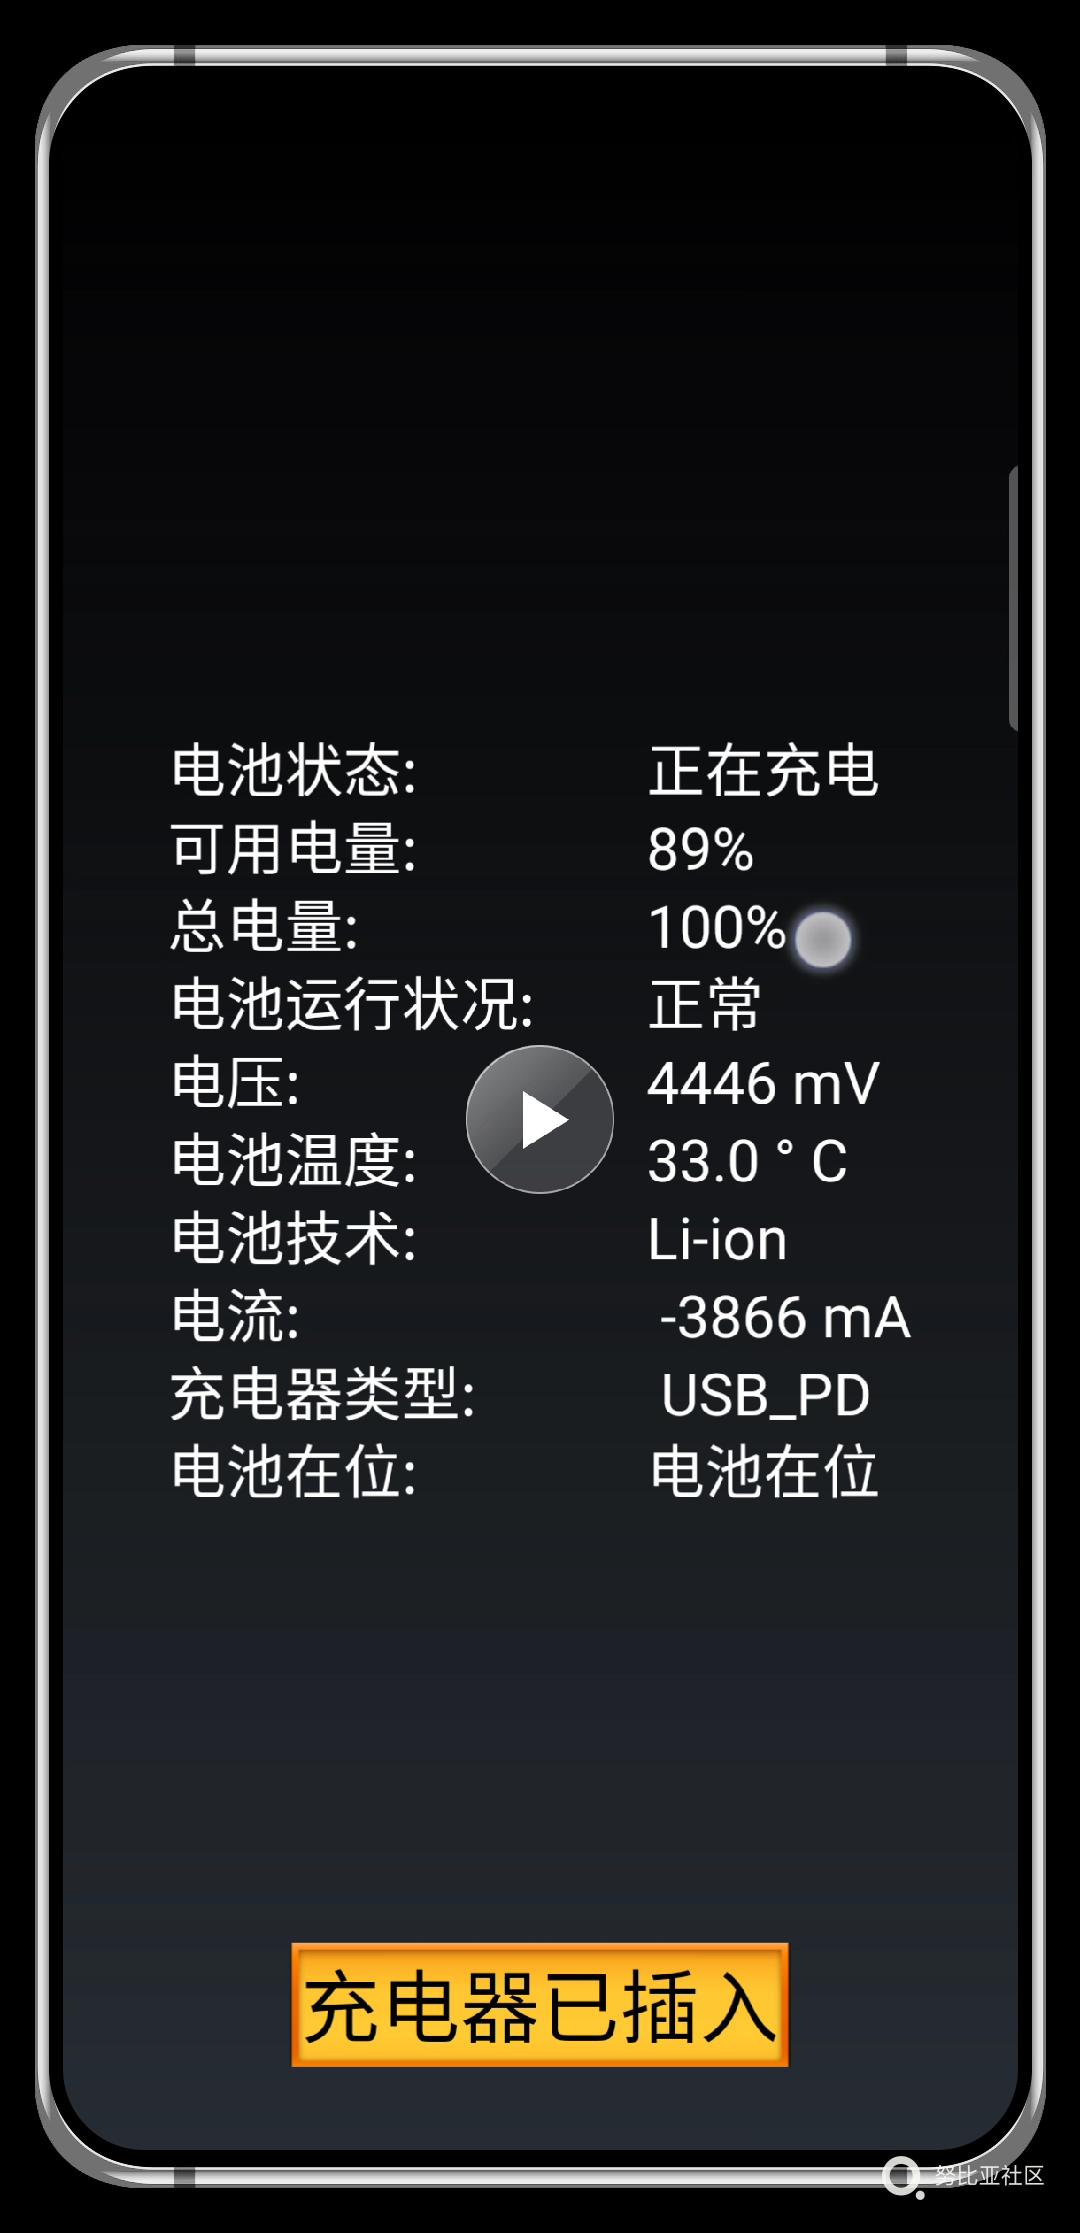 Screenshot_2020-04-18-14-26-23-243.png